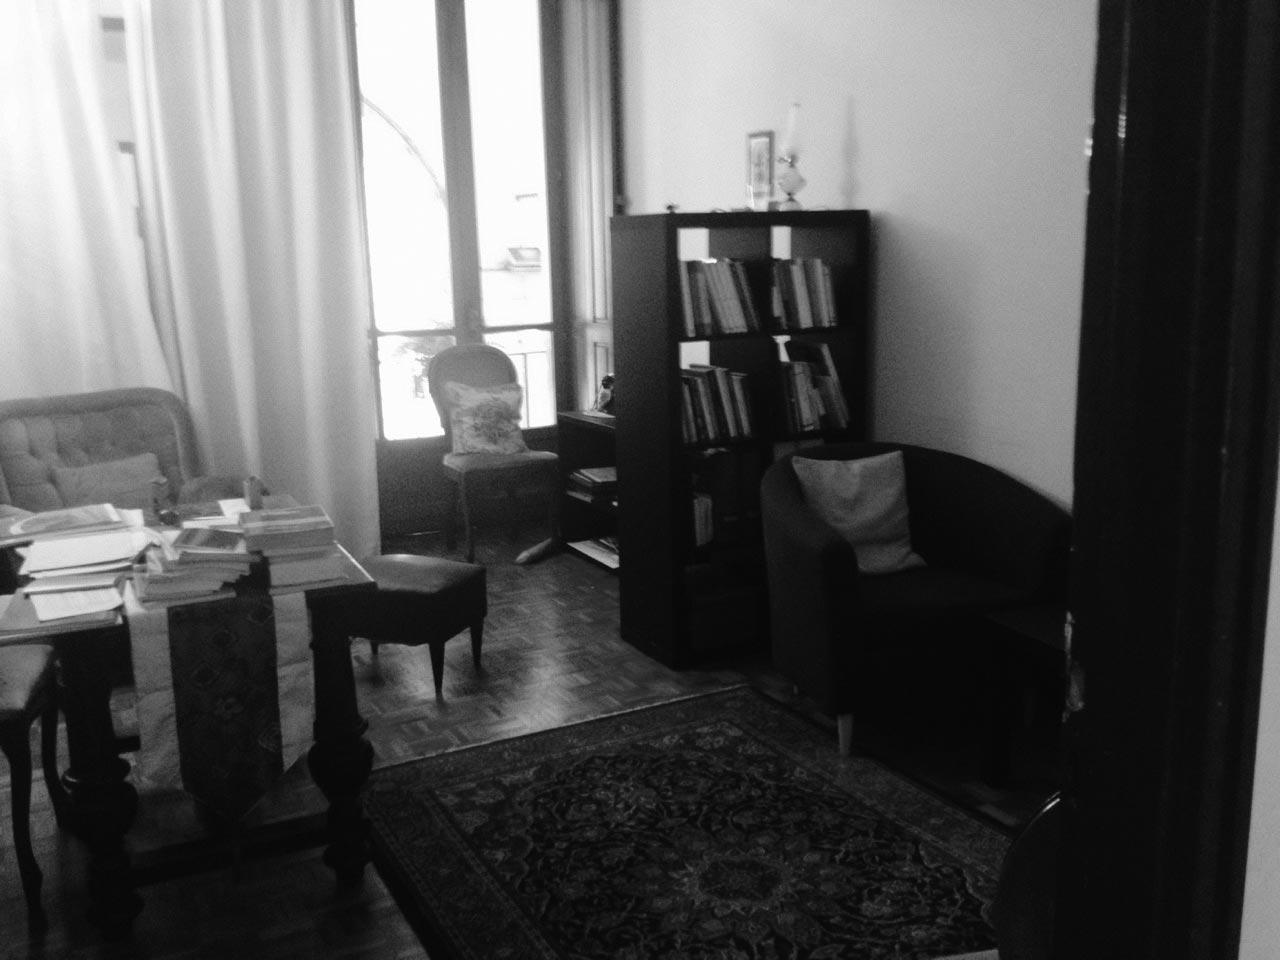 Studio psicologo sala 1